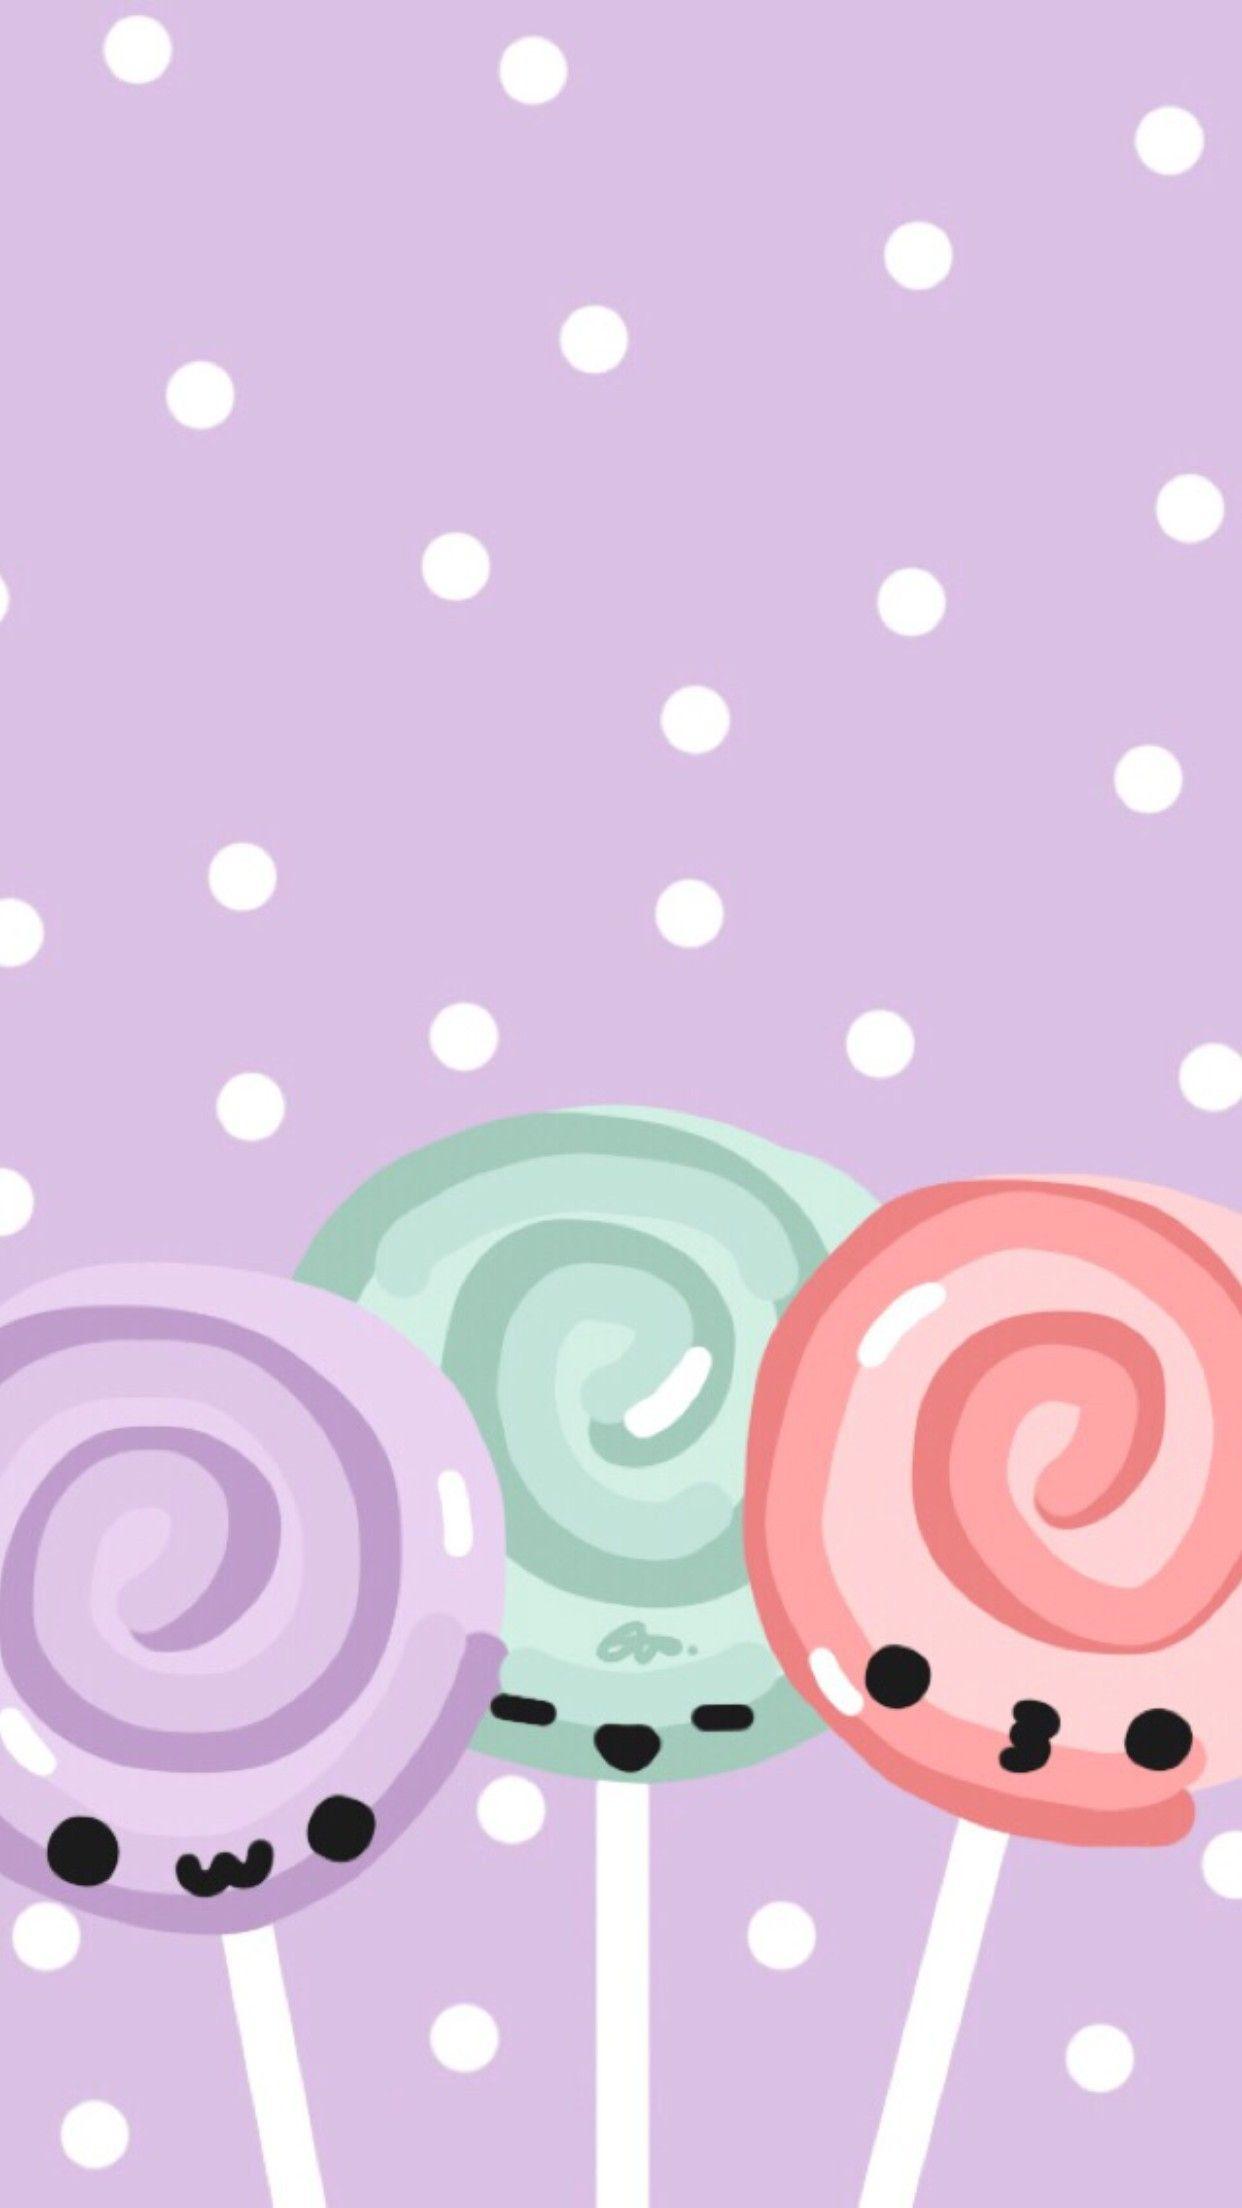 89 Kawaii Phone Wallpapers On Wallpaperplay Cute Wallpaper For Phone Cute Pastel Background Cute Pastel Wallpaper